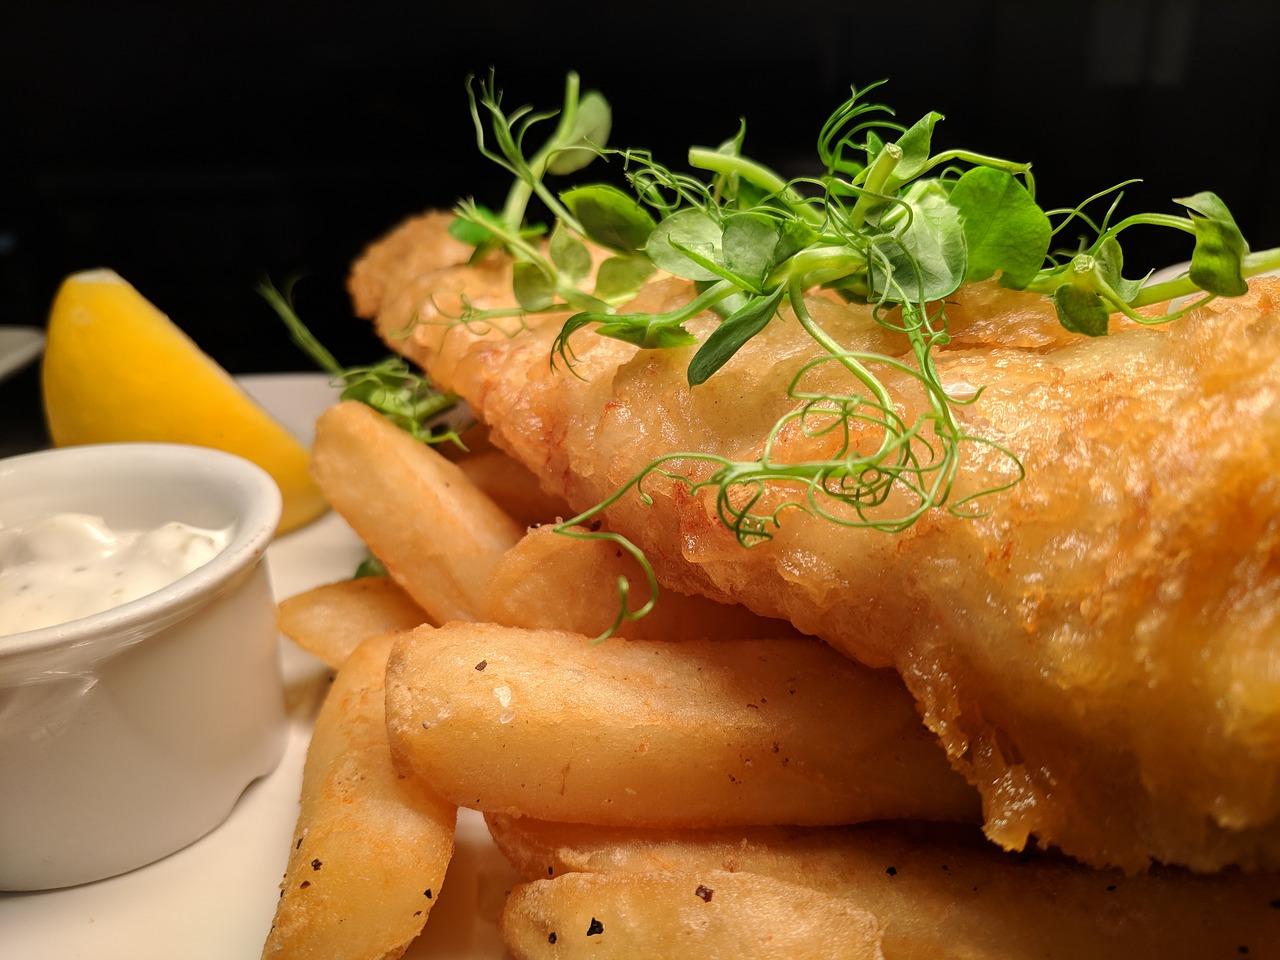 fish-and-chips-3591073_1280 pixabay.jpg